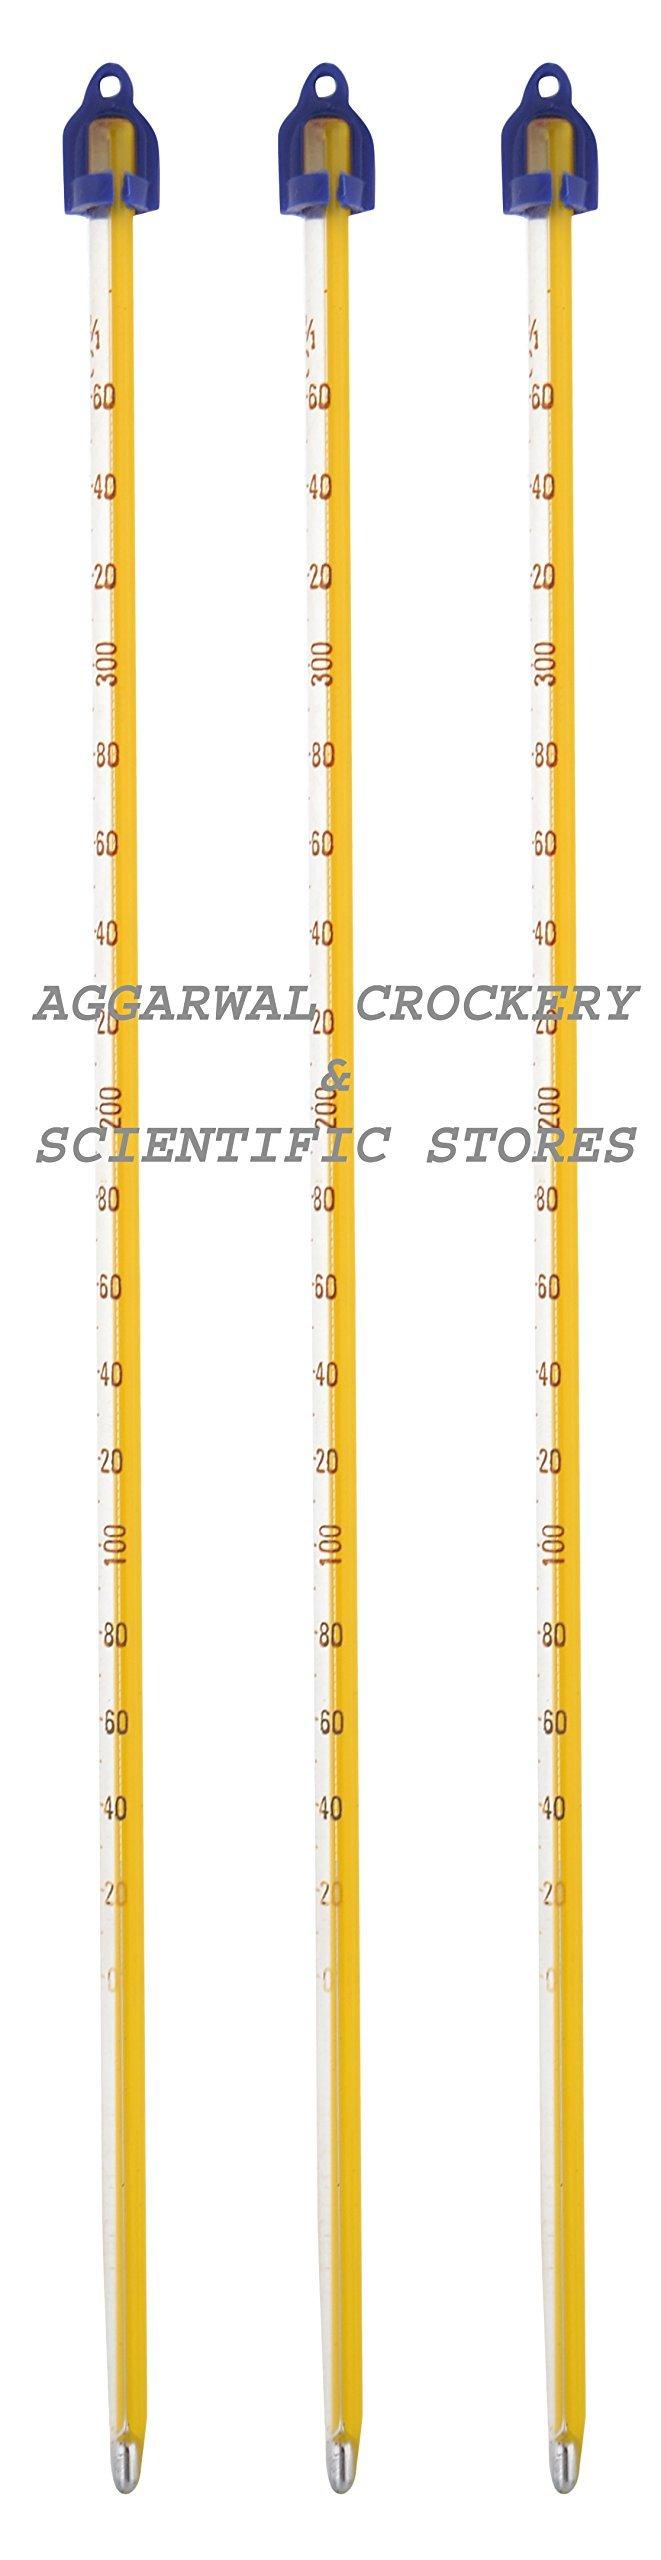 Aggarwal Crockery & Scientific Stores Thermomter Mercury 360 Deg. (Pack Of 3)